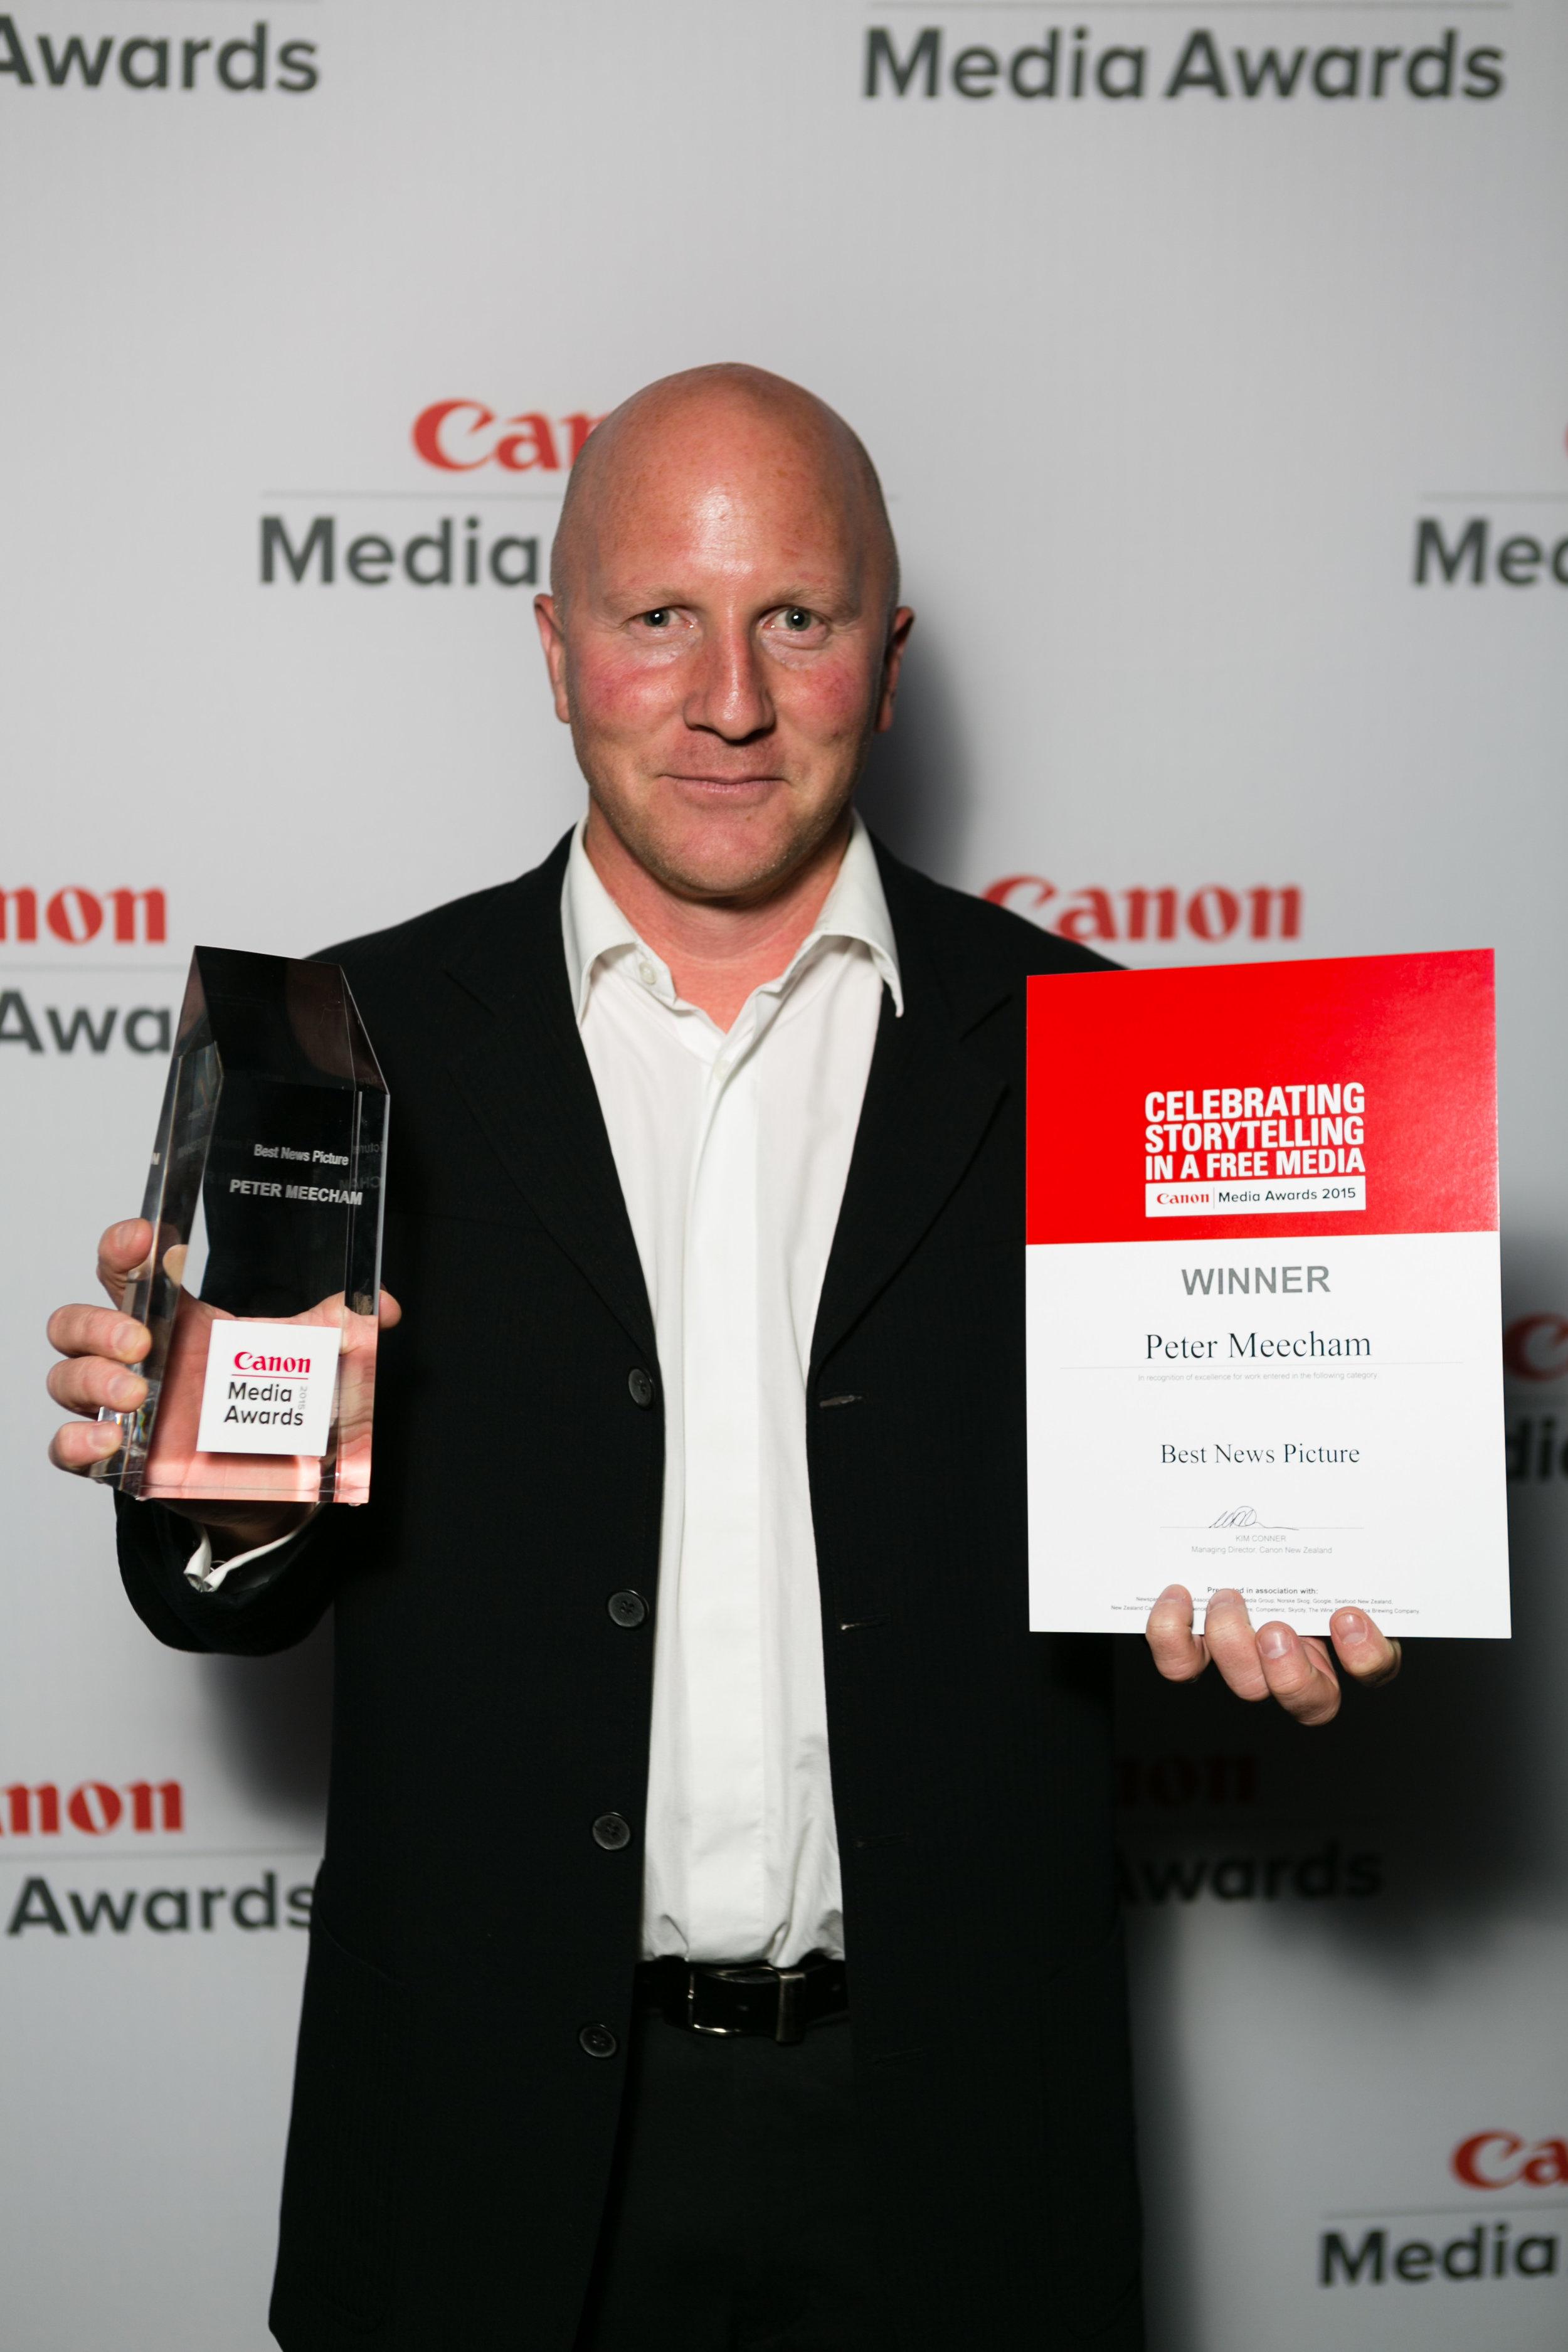 canon_media_awards_2015_interlike_nz_clinton_tudor-5999-215.jpg